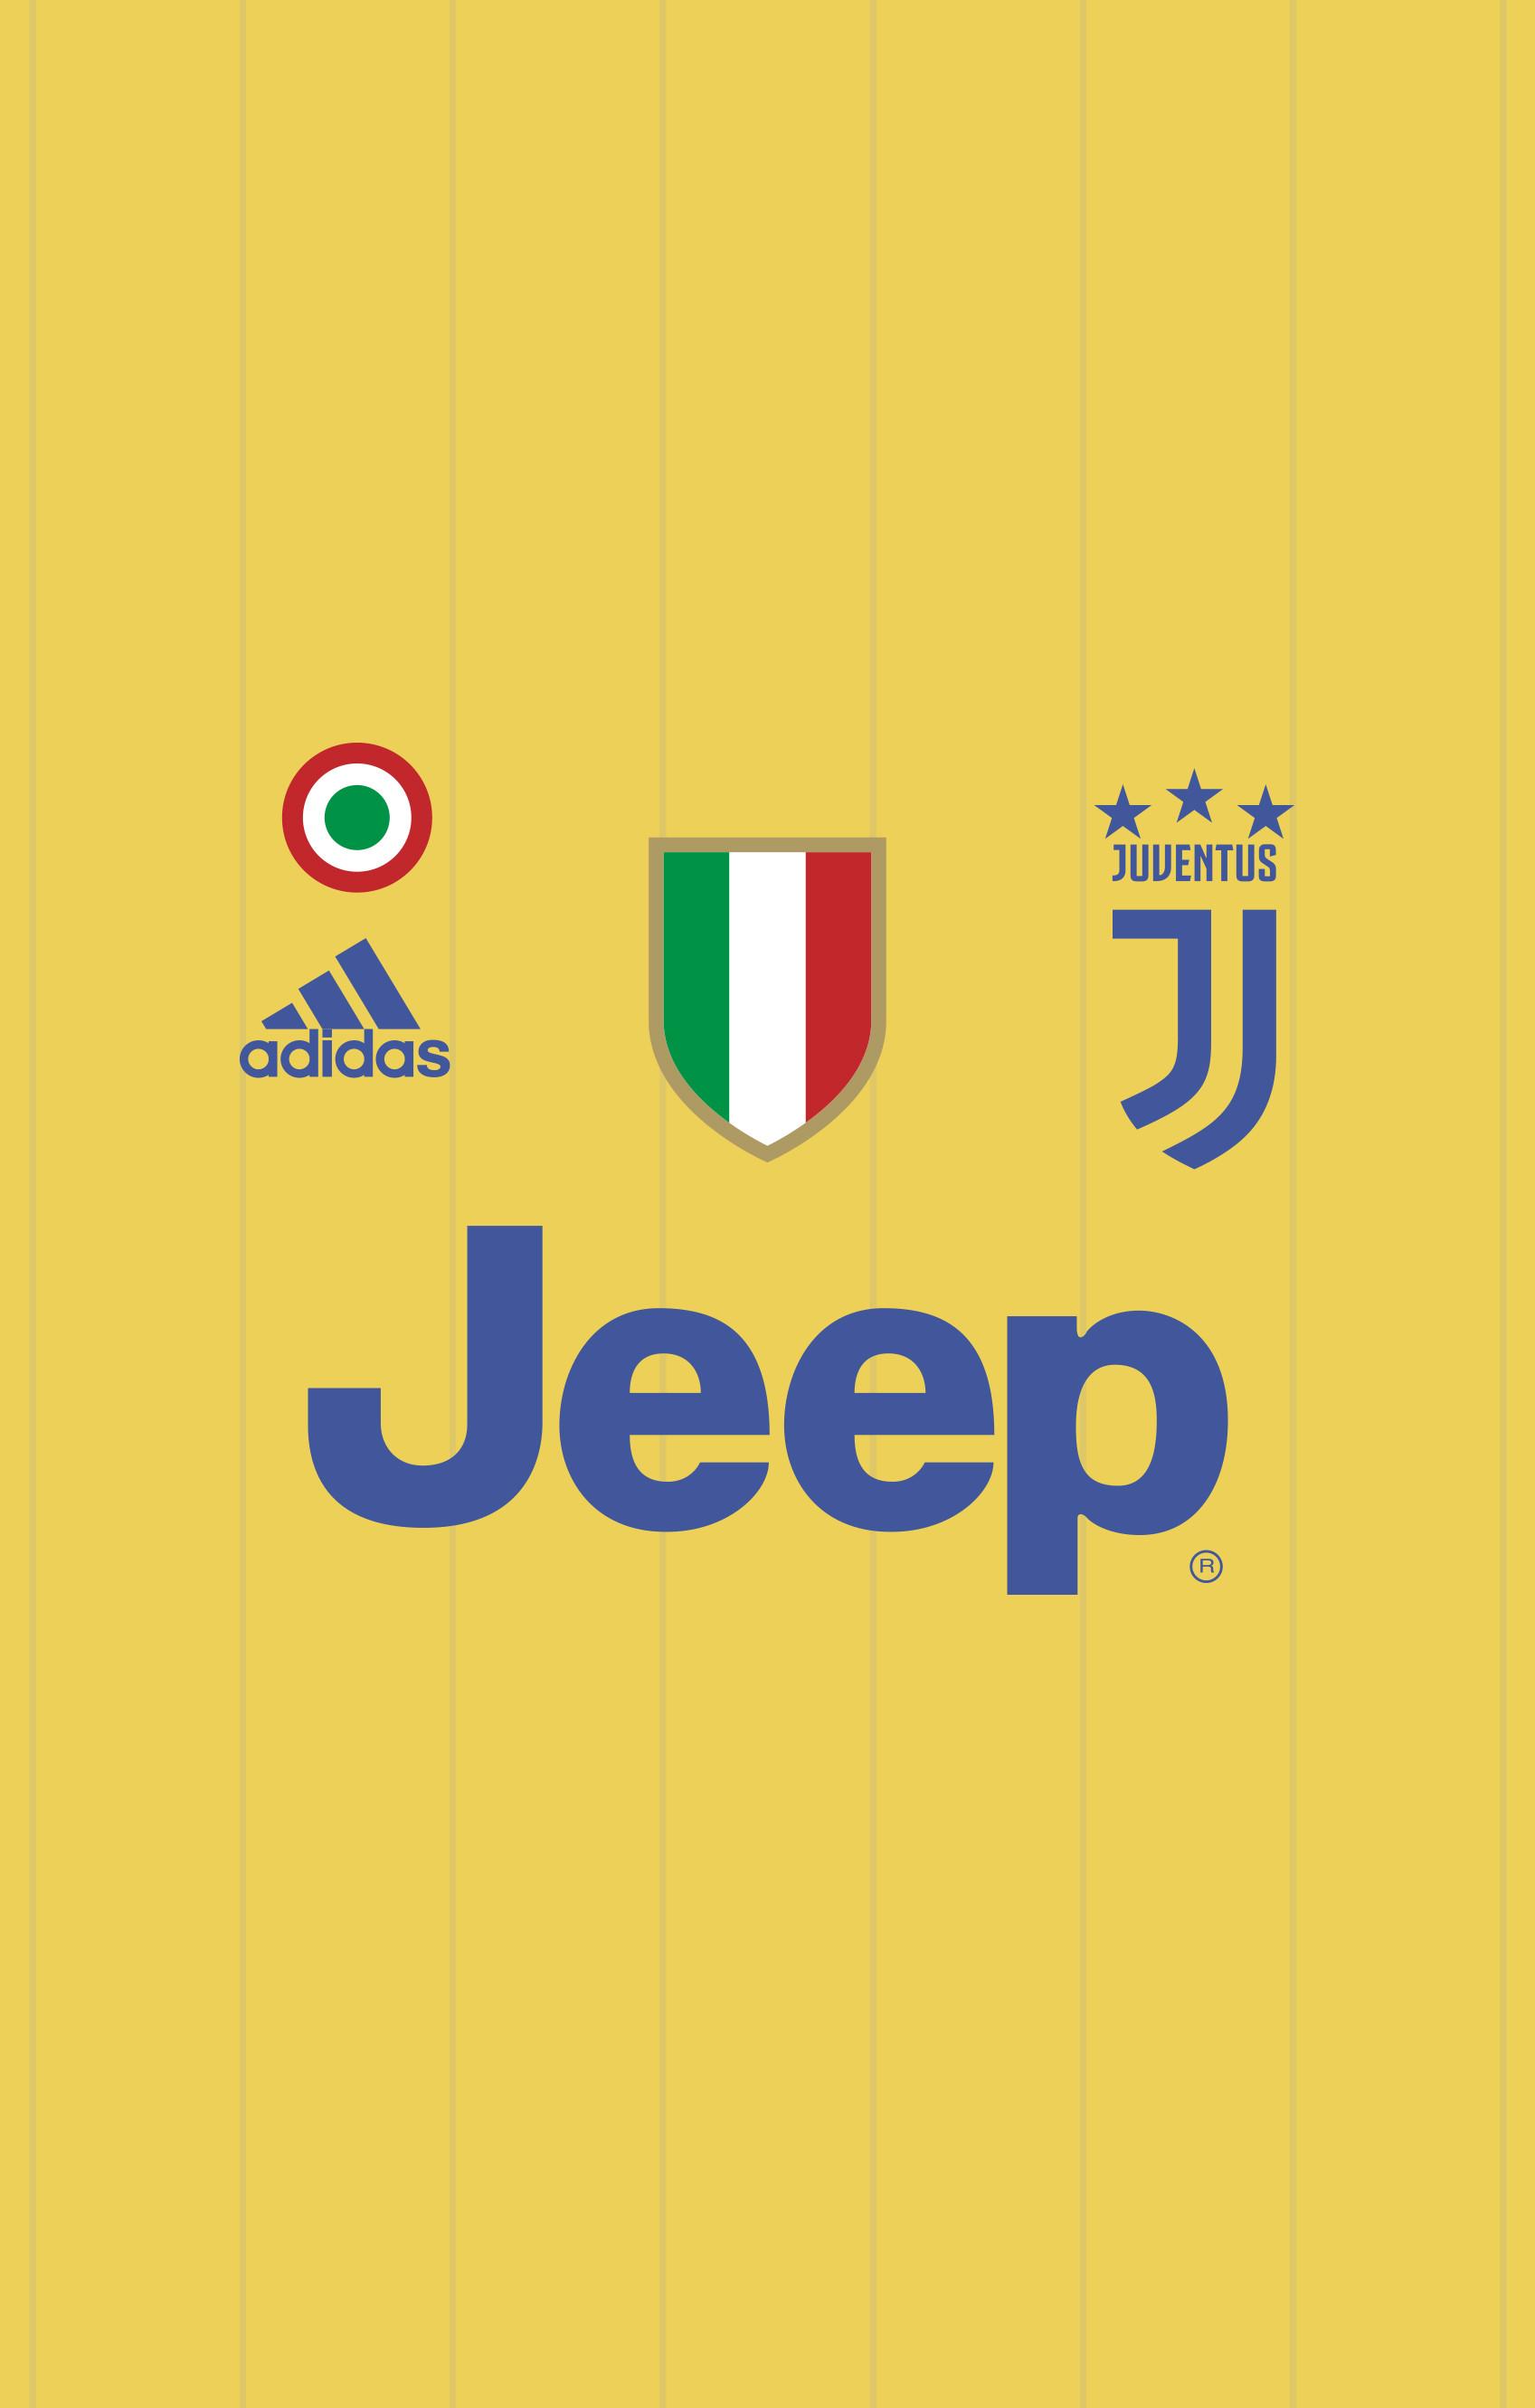 Sfondi Juventus 75 Immagini